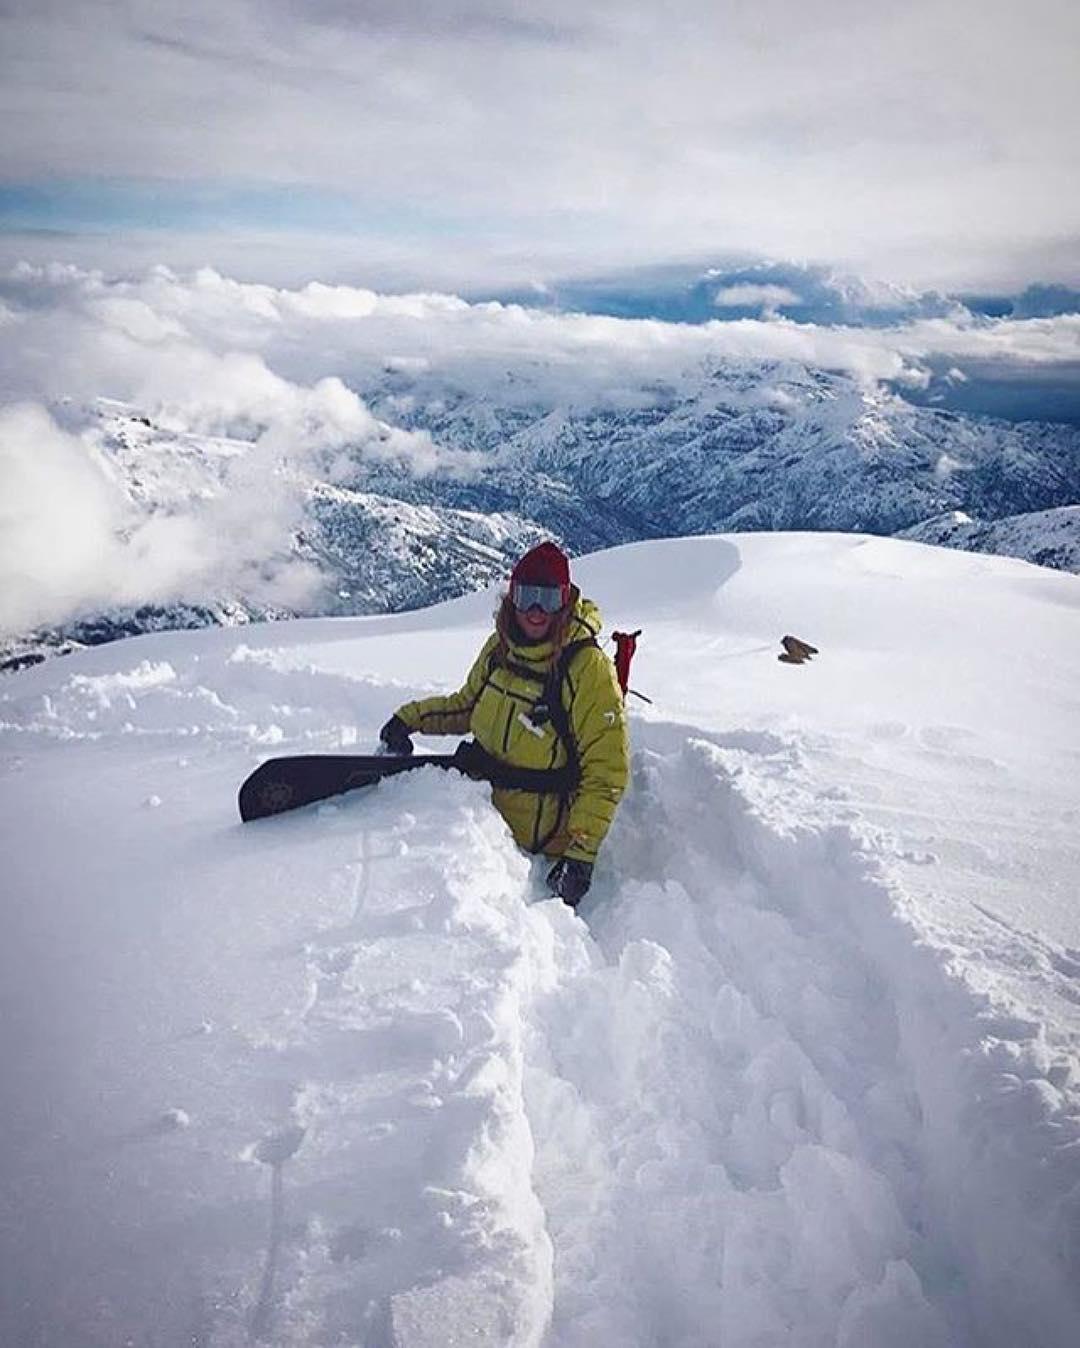 #TeamRider @inaquiilopez ・・・ Pow for dayzzzz here in Chile. #enjoytheoutdoorslonger